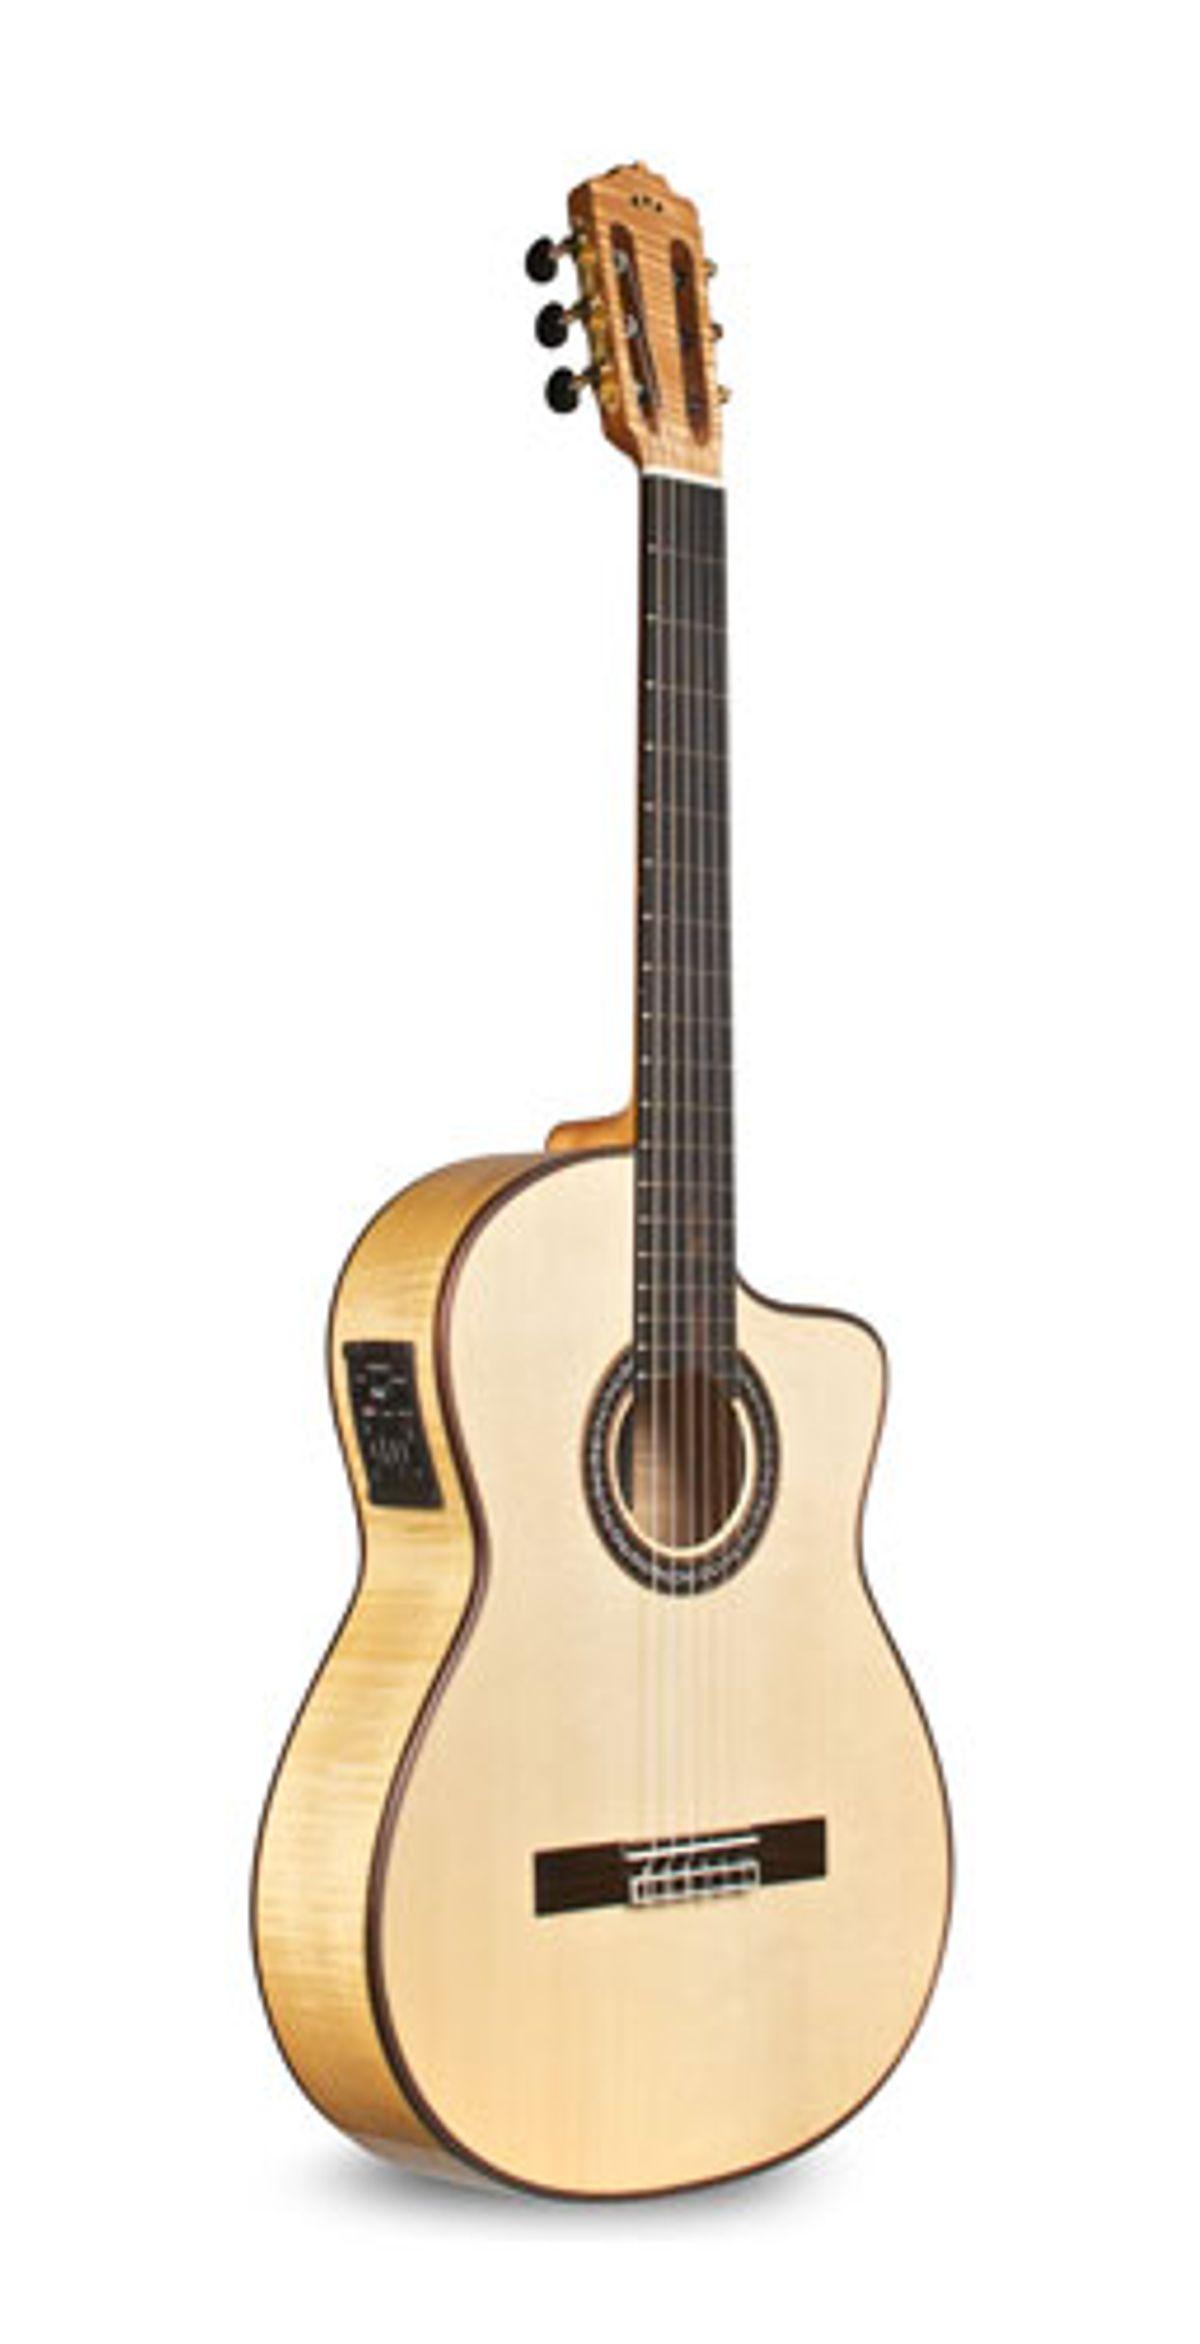 Cordoba Guitars Introduces the GK Pro Maple